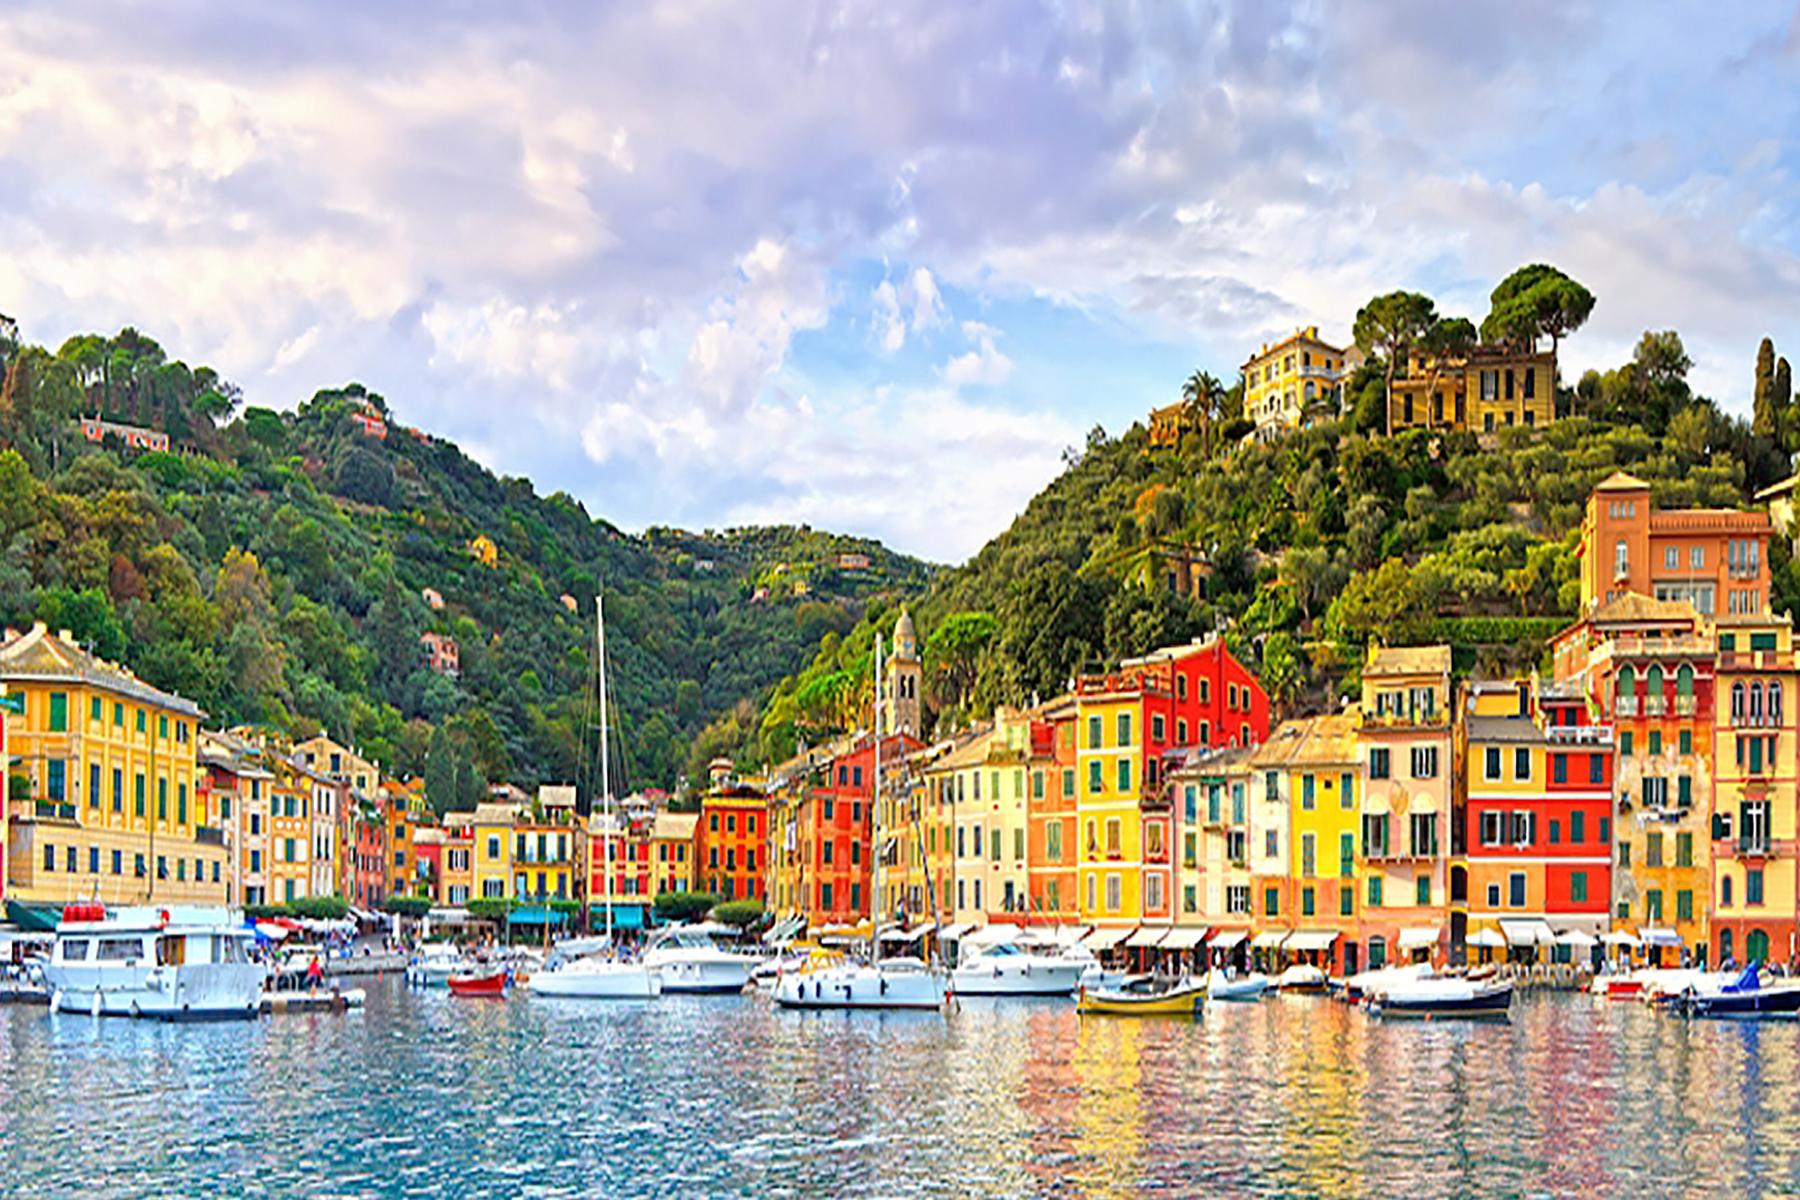 Italy_Portofino.jpg